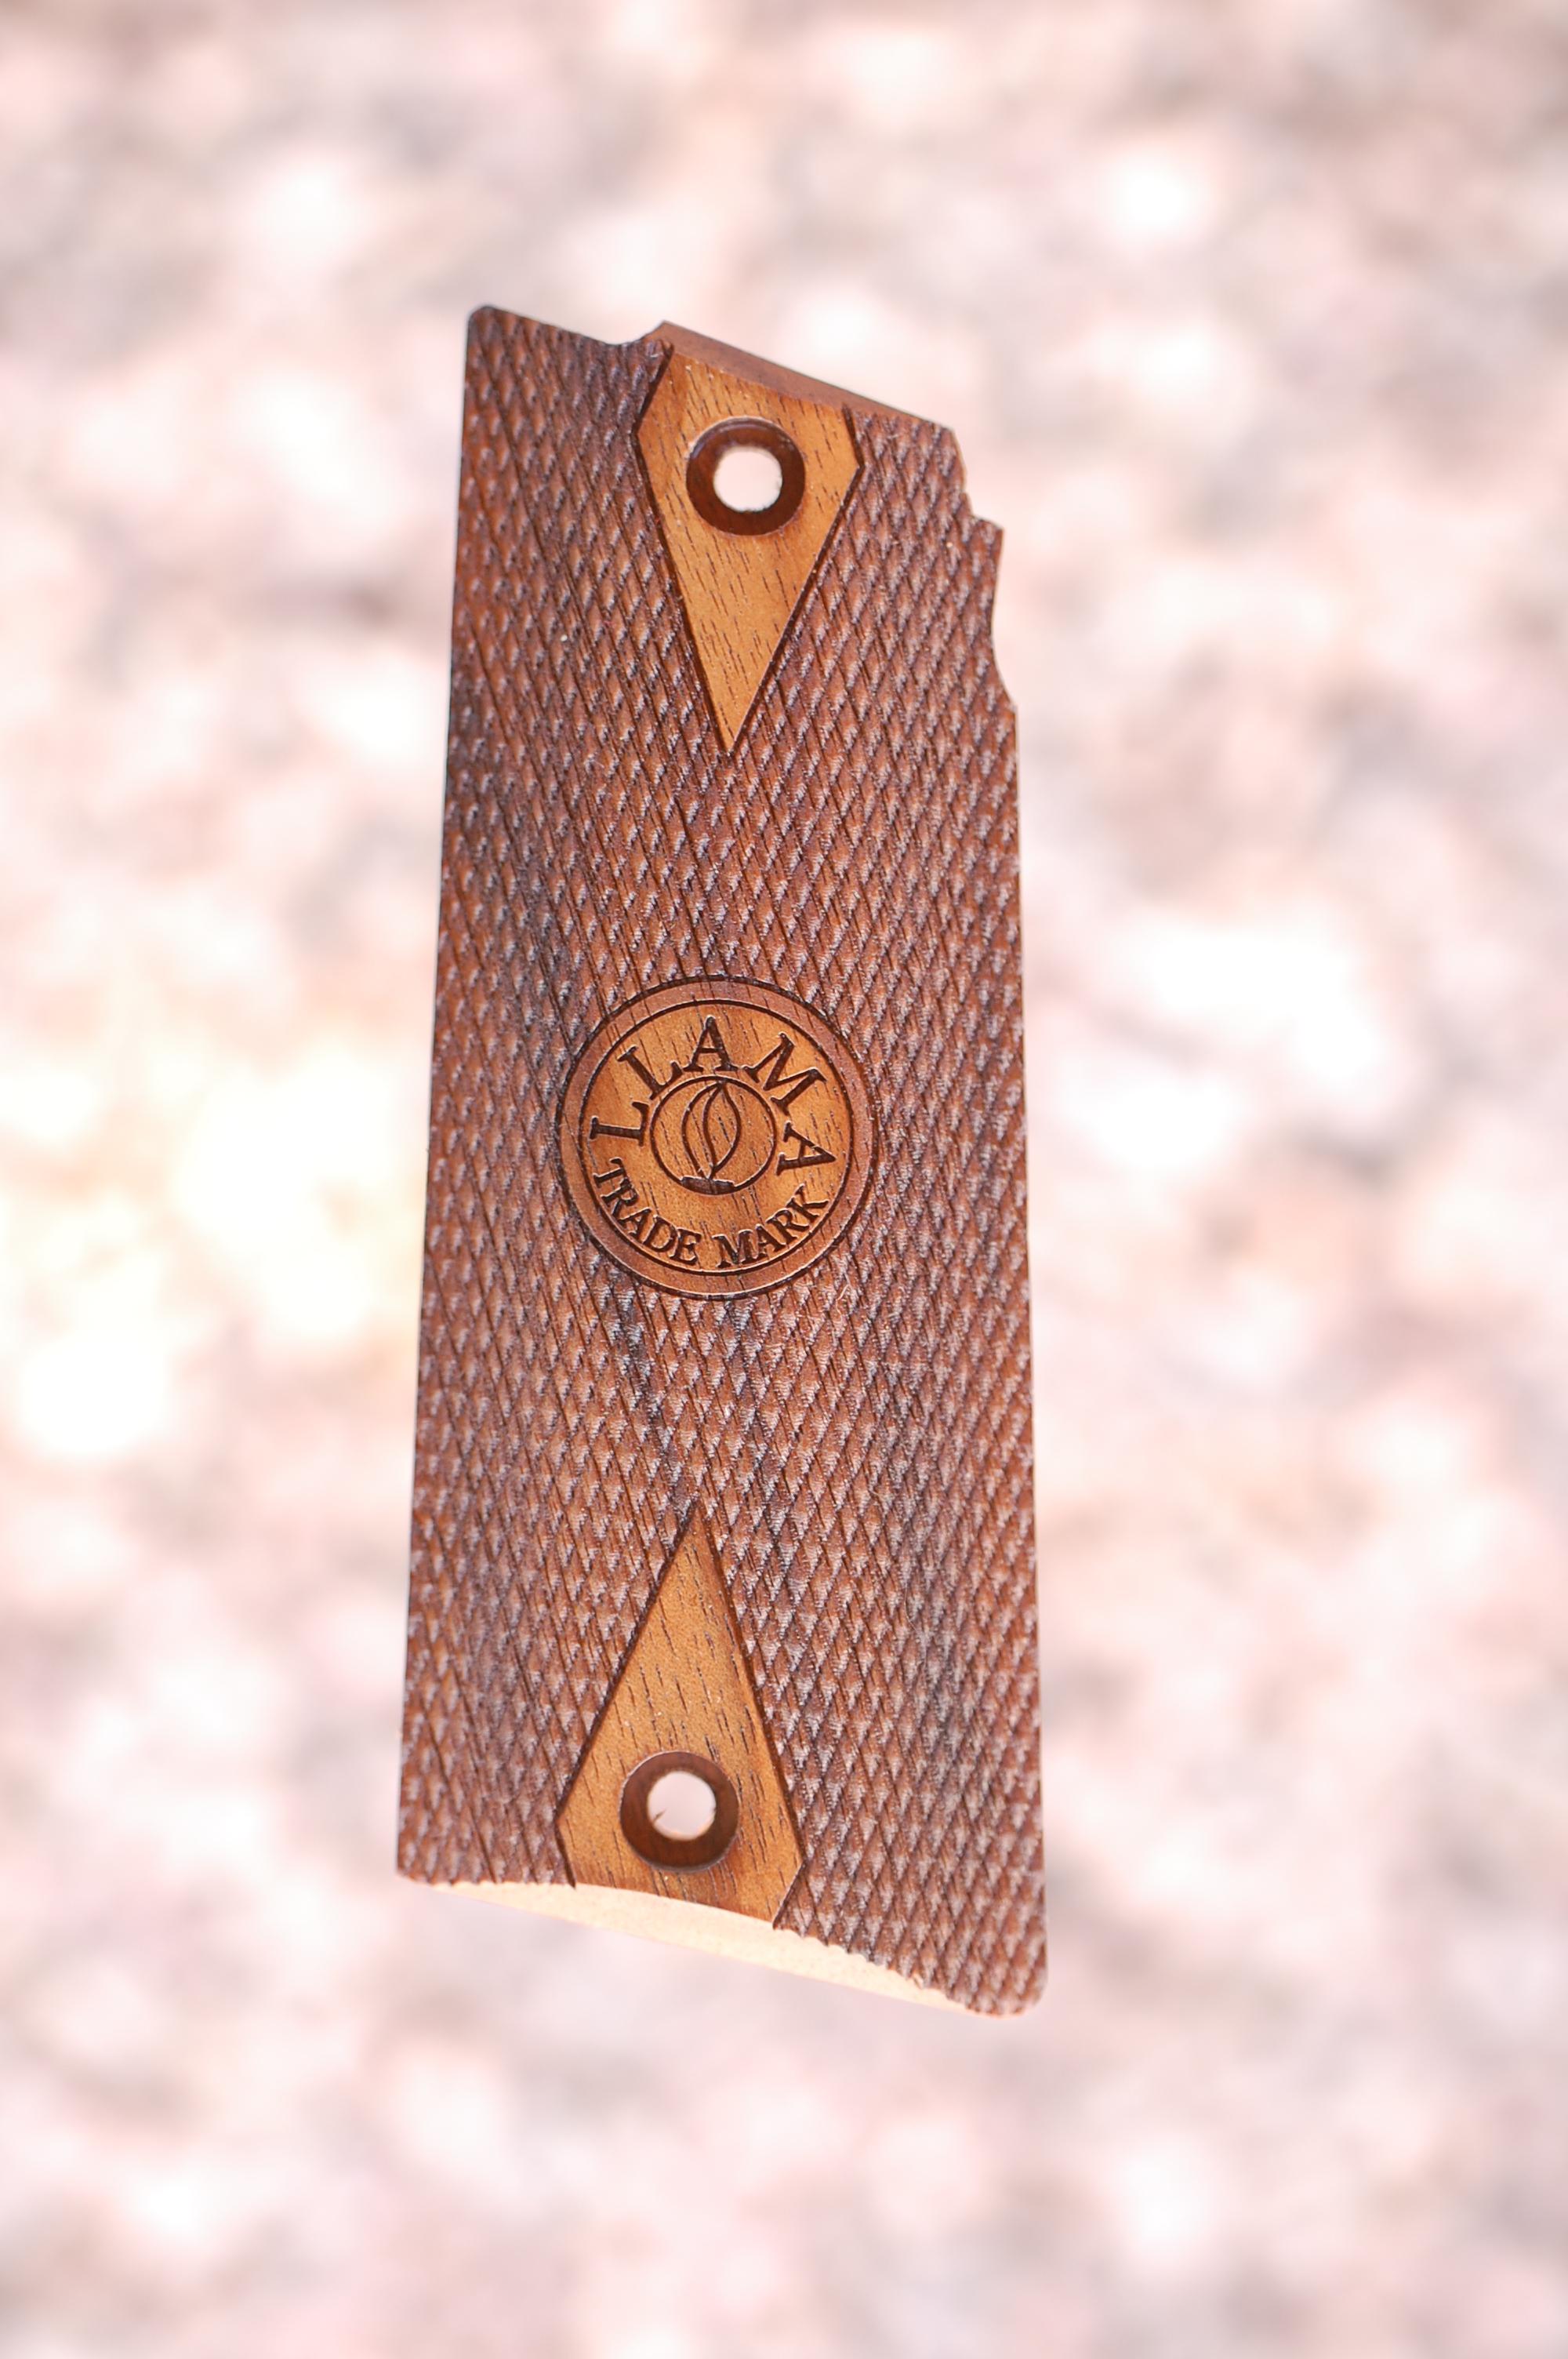 LLAMA Max I grips (checkered+logo) - full size